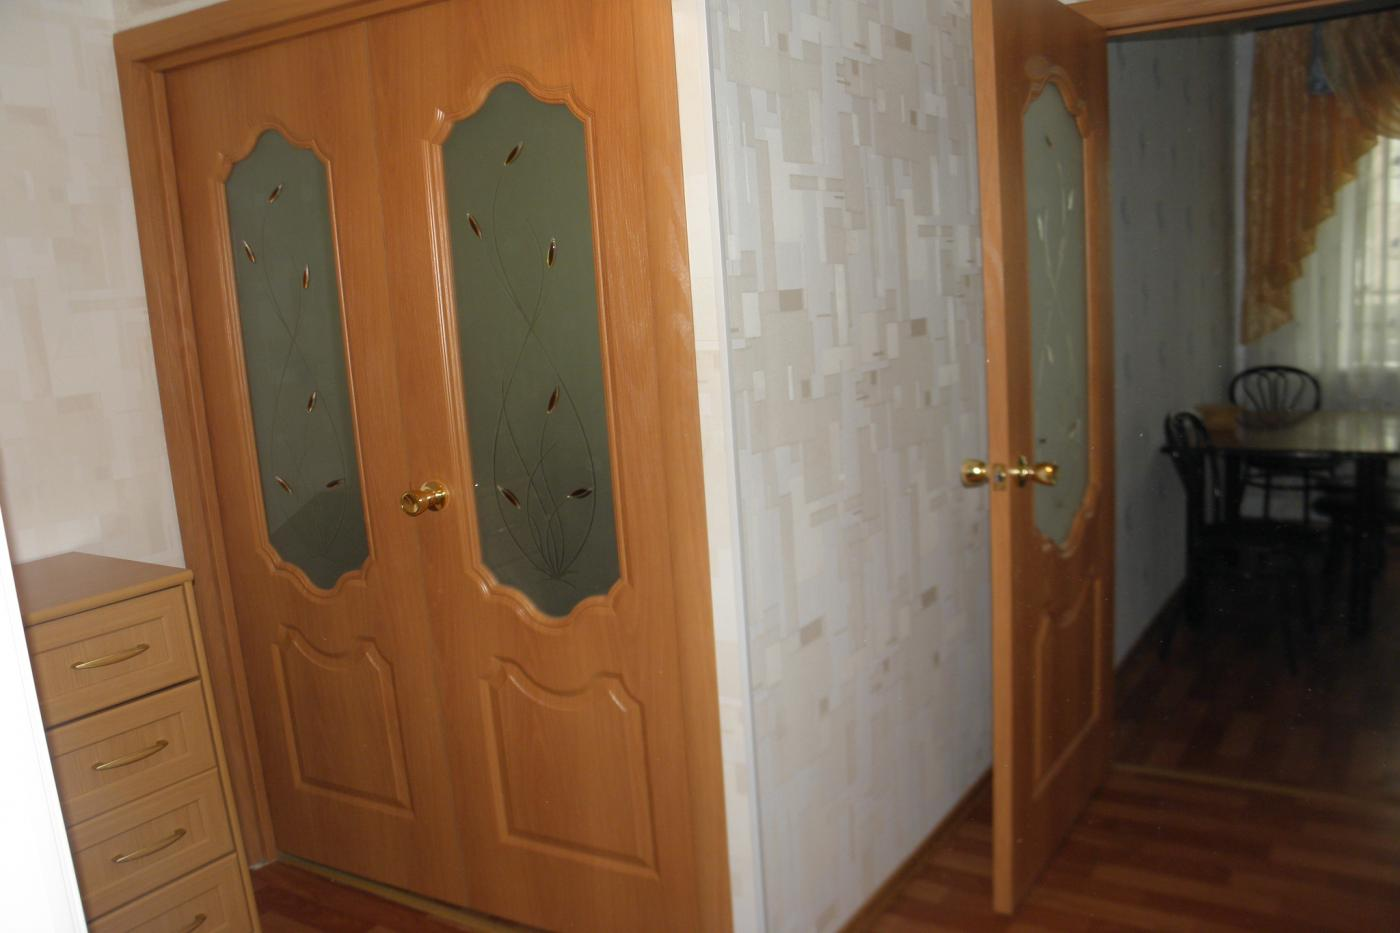 1-комнатная квартира посуточно (вариант № 1497), ул. Флегонтова улица, фото № 8